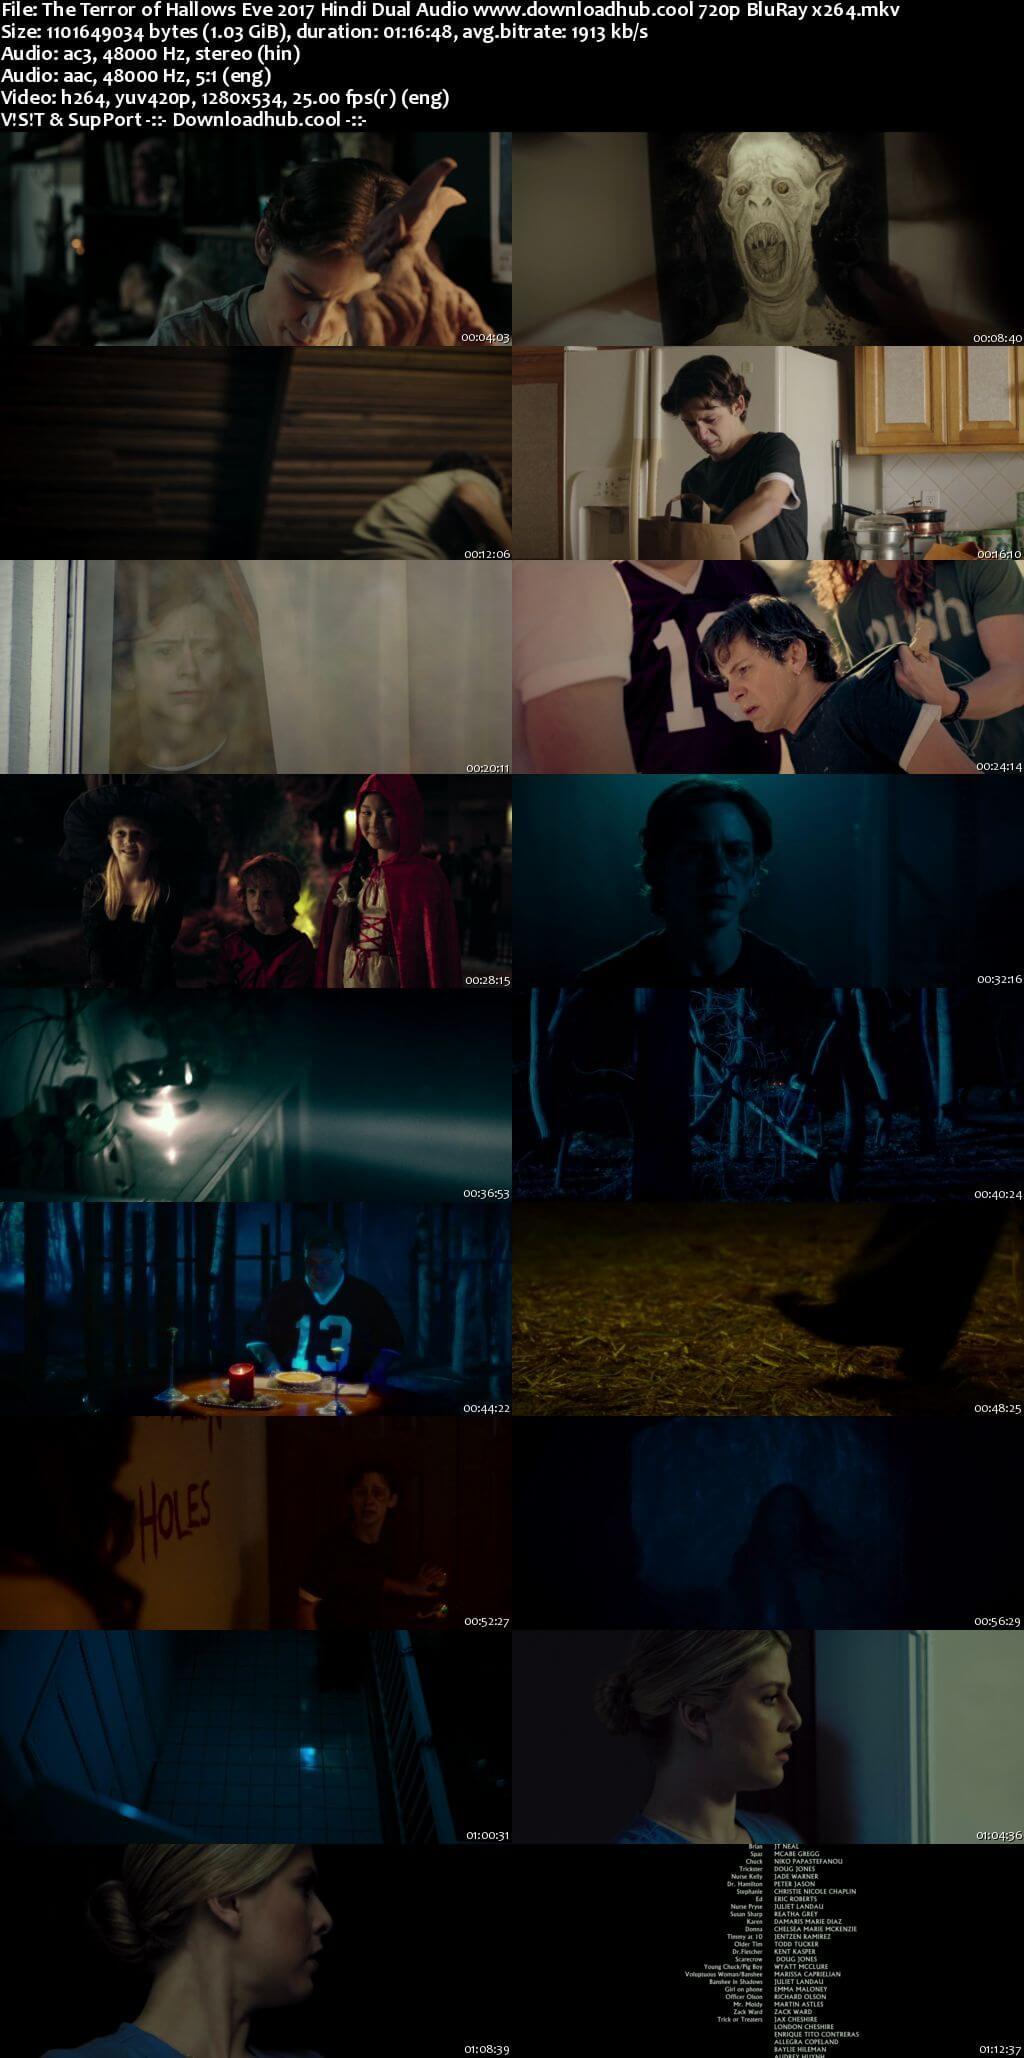 The Terror of Hallows Eve 2017 Hindi Dual Audio 720p BluRay x264